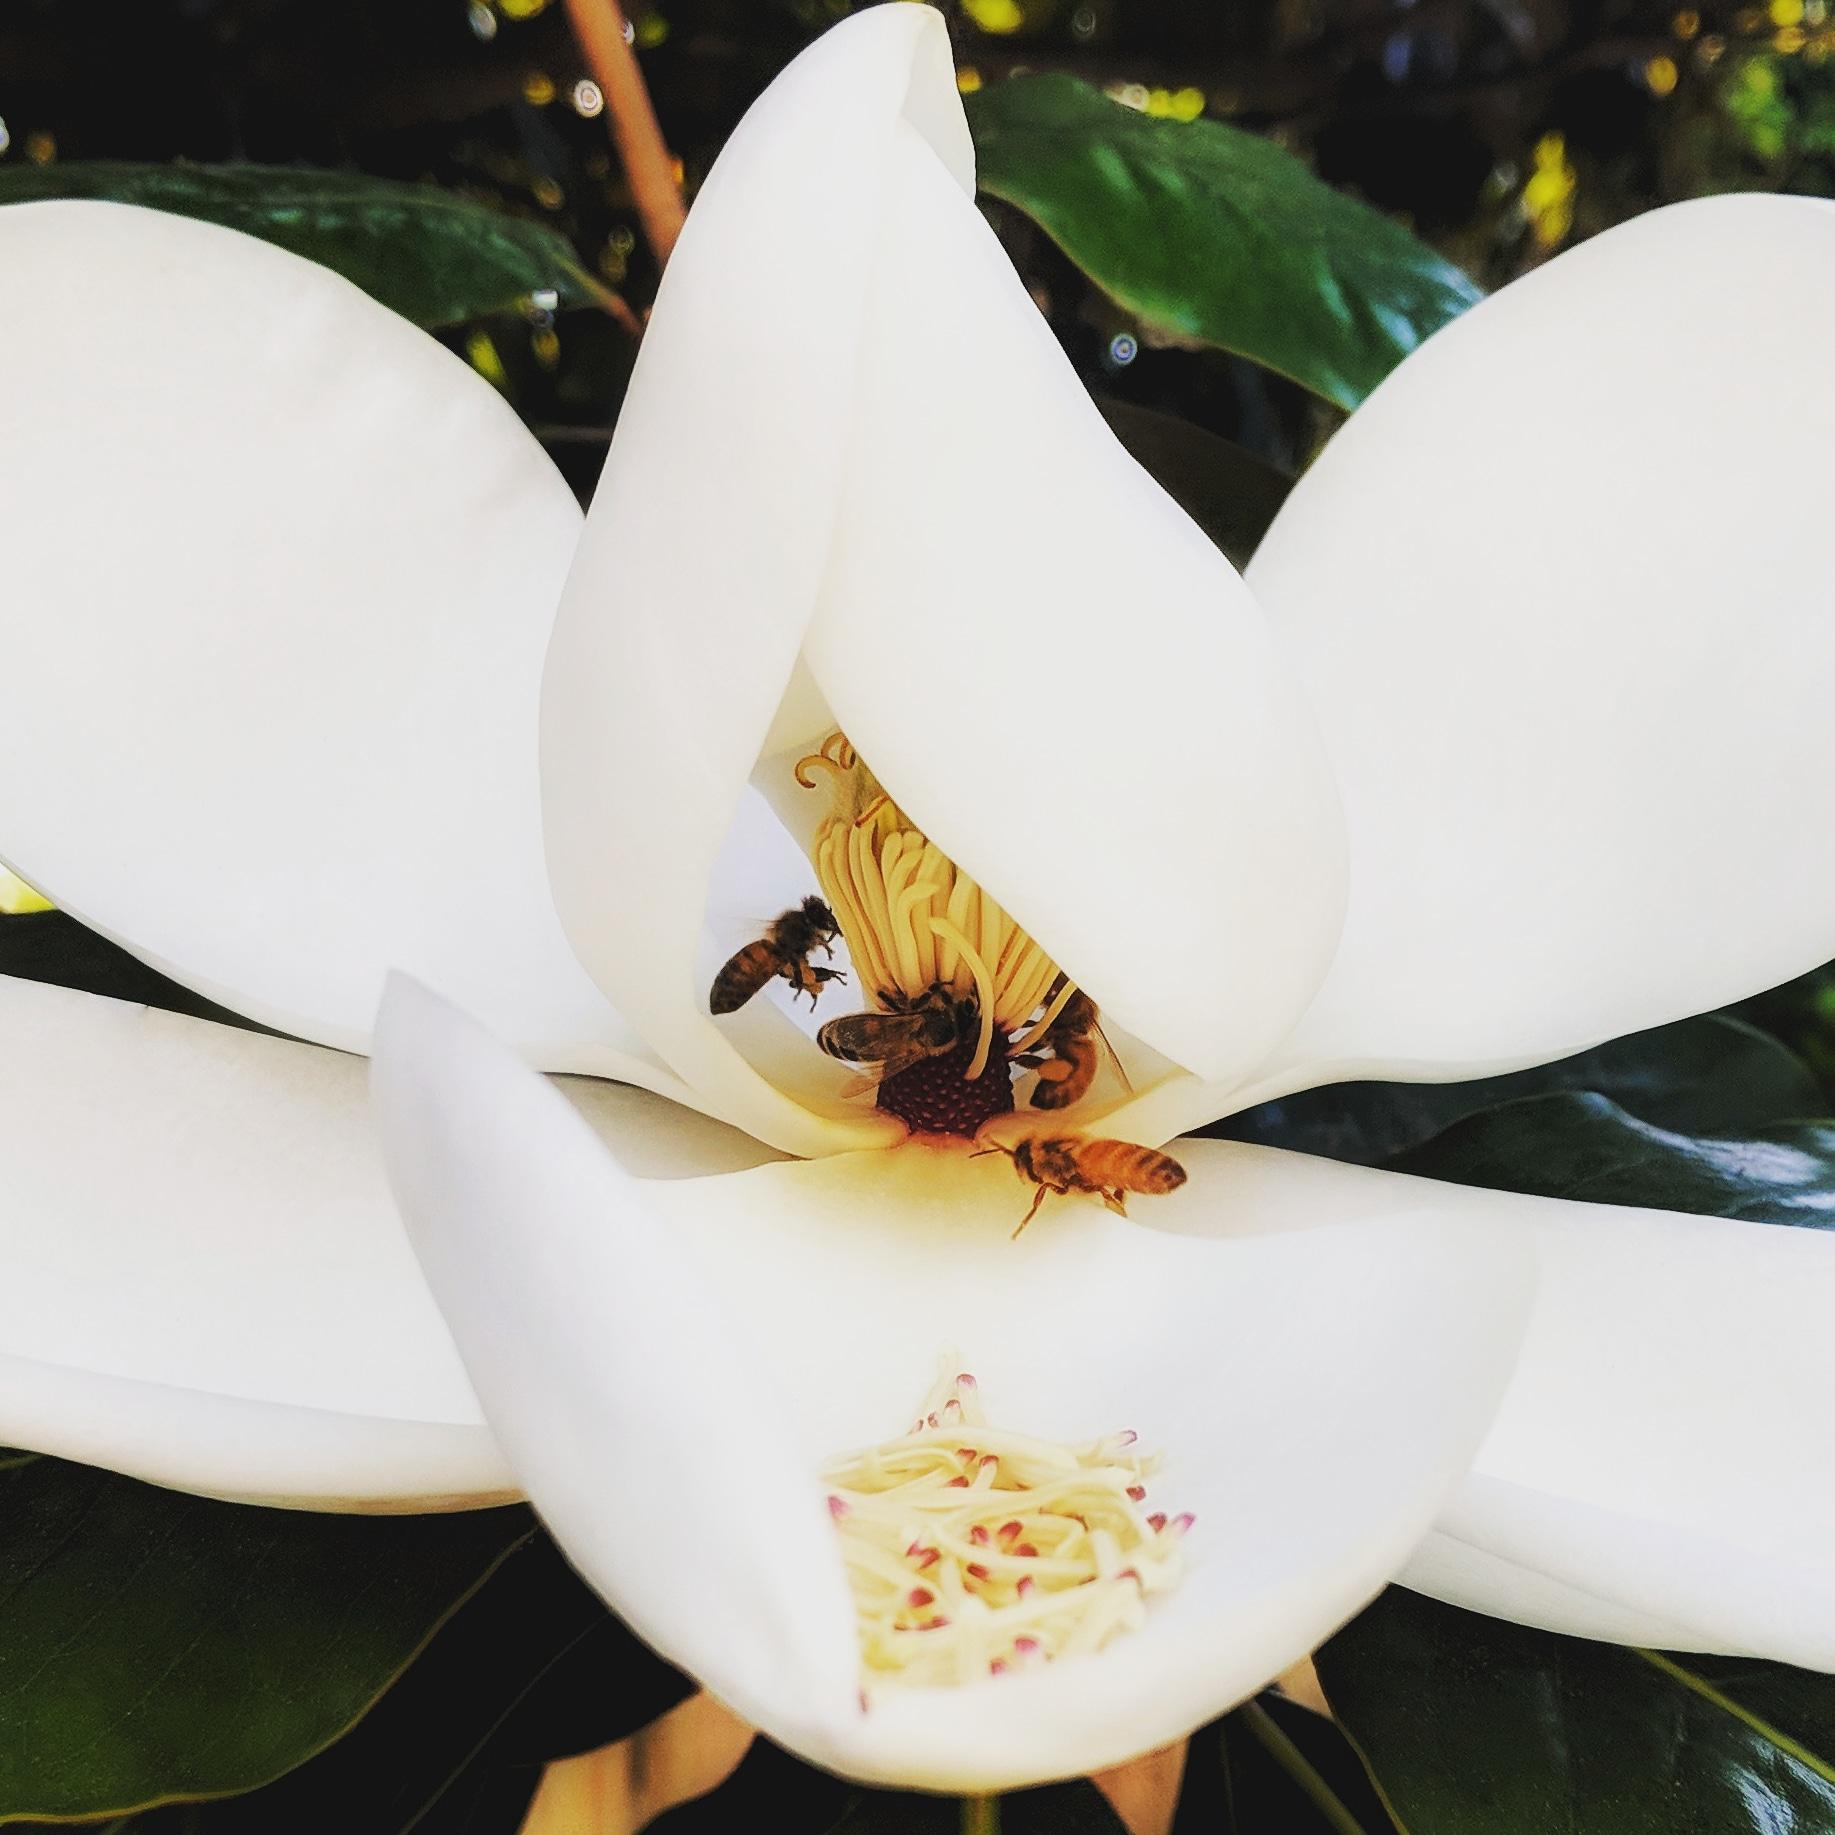 ©Terri-Nakamura_Magnolia-bees-IG-20180731_223407_789